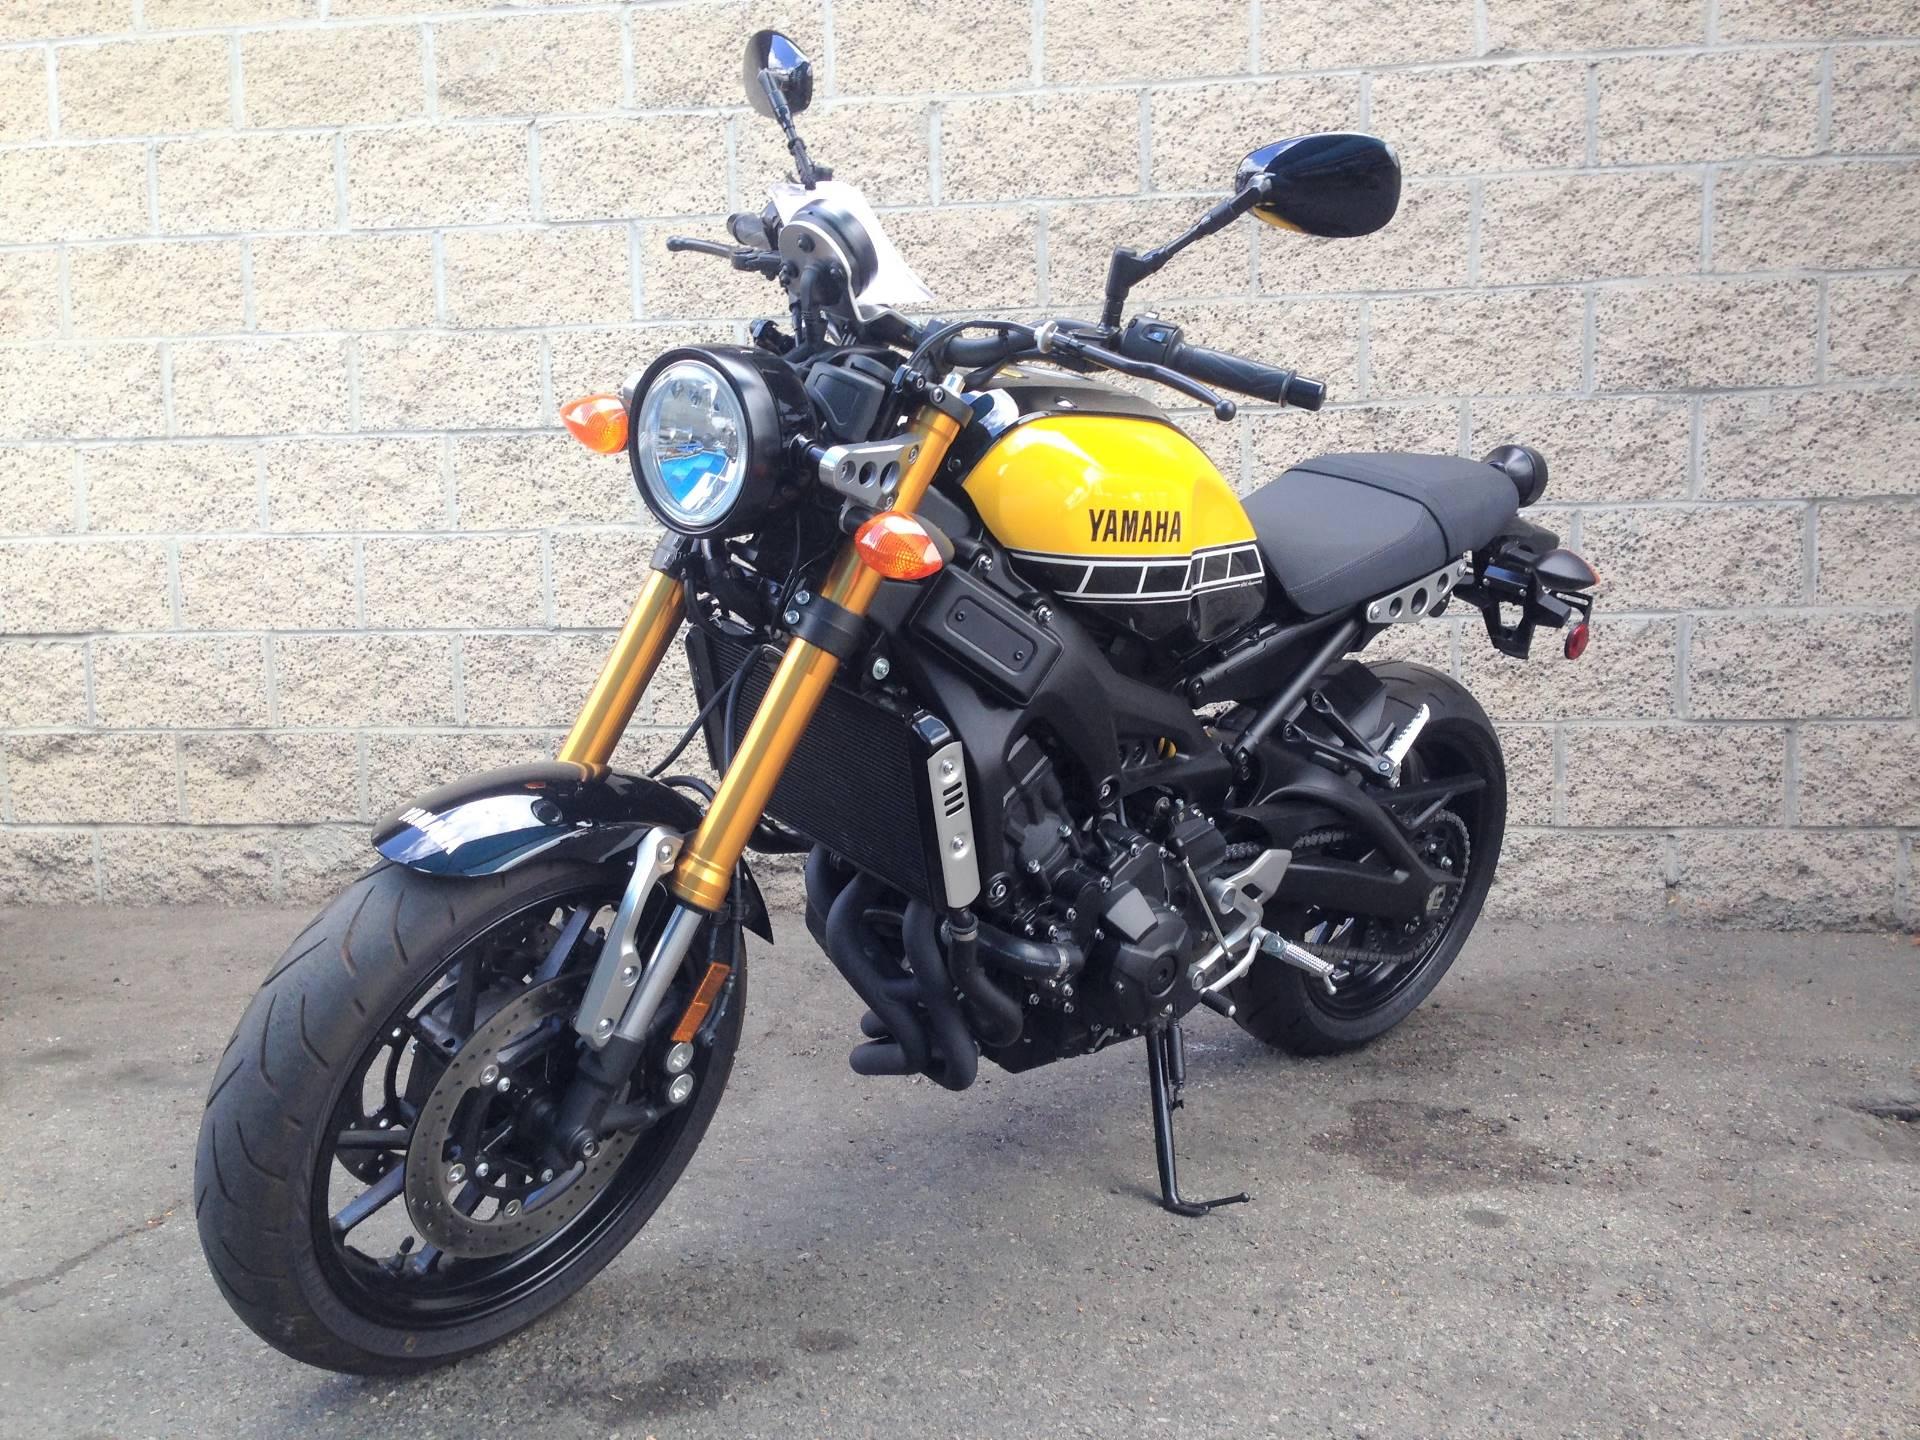 2016 Yamaha XSR900 1